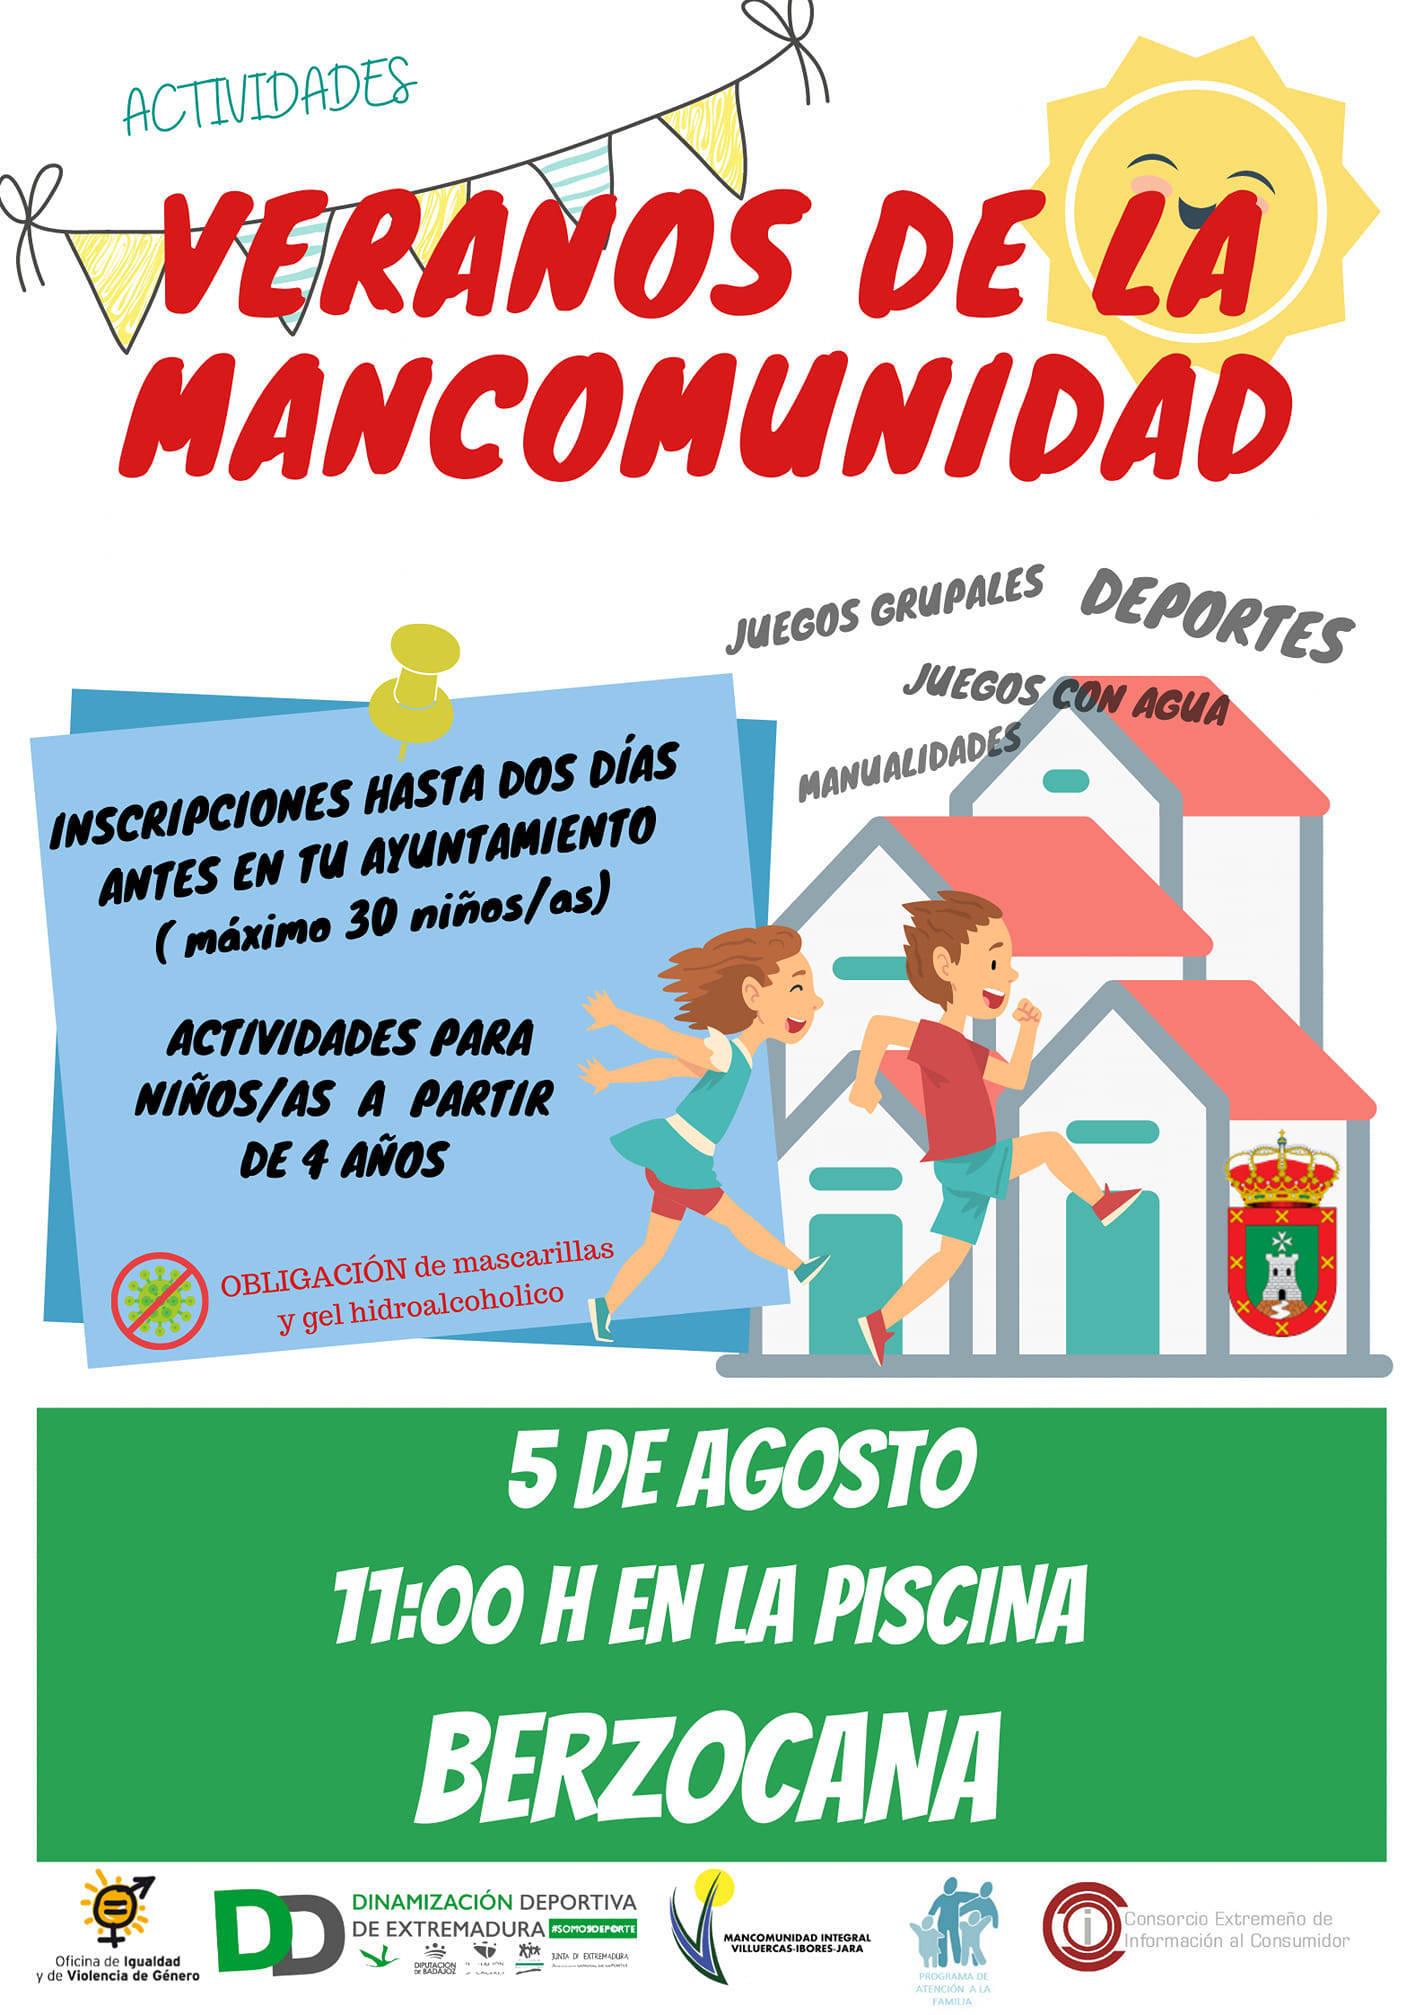 Veranos de la Mancomunidad (2021) - Berzocana (Cáceres)